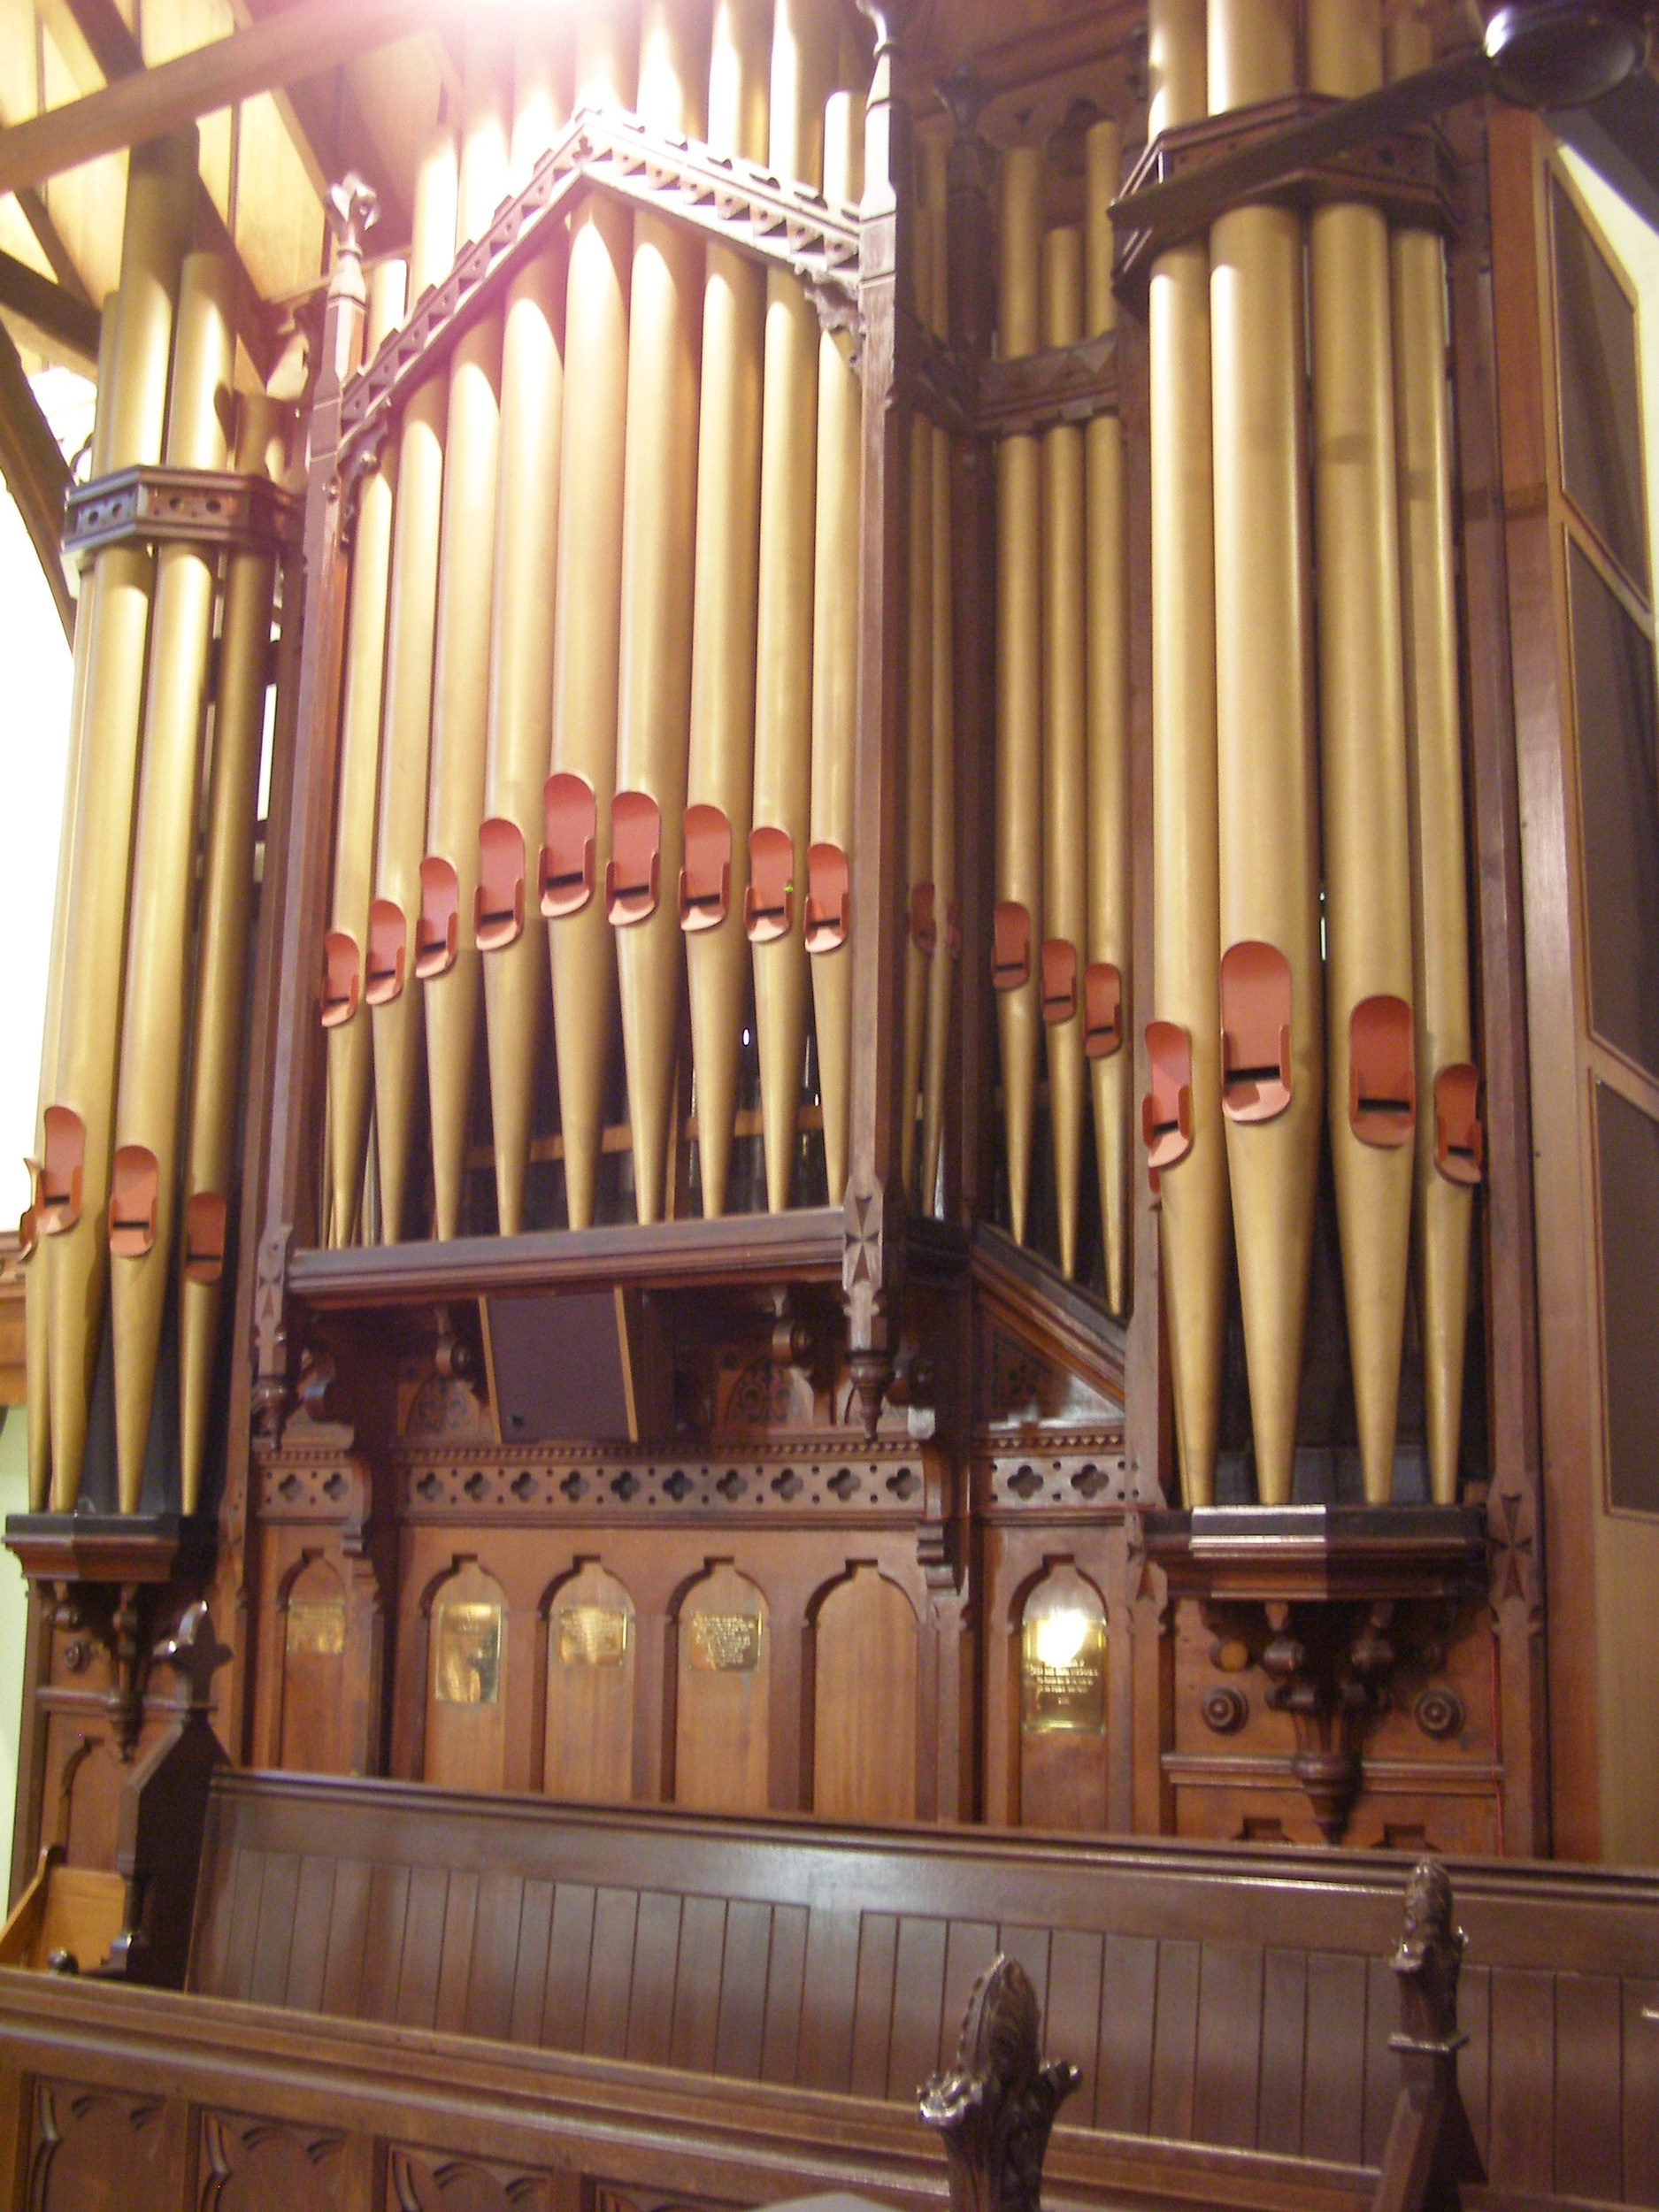 1882 Cole & Duckworth pipe organ